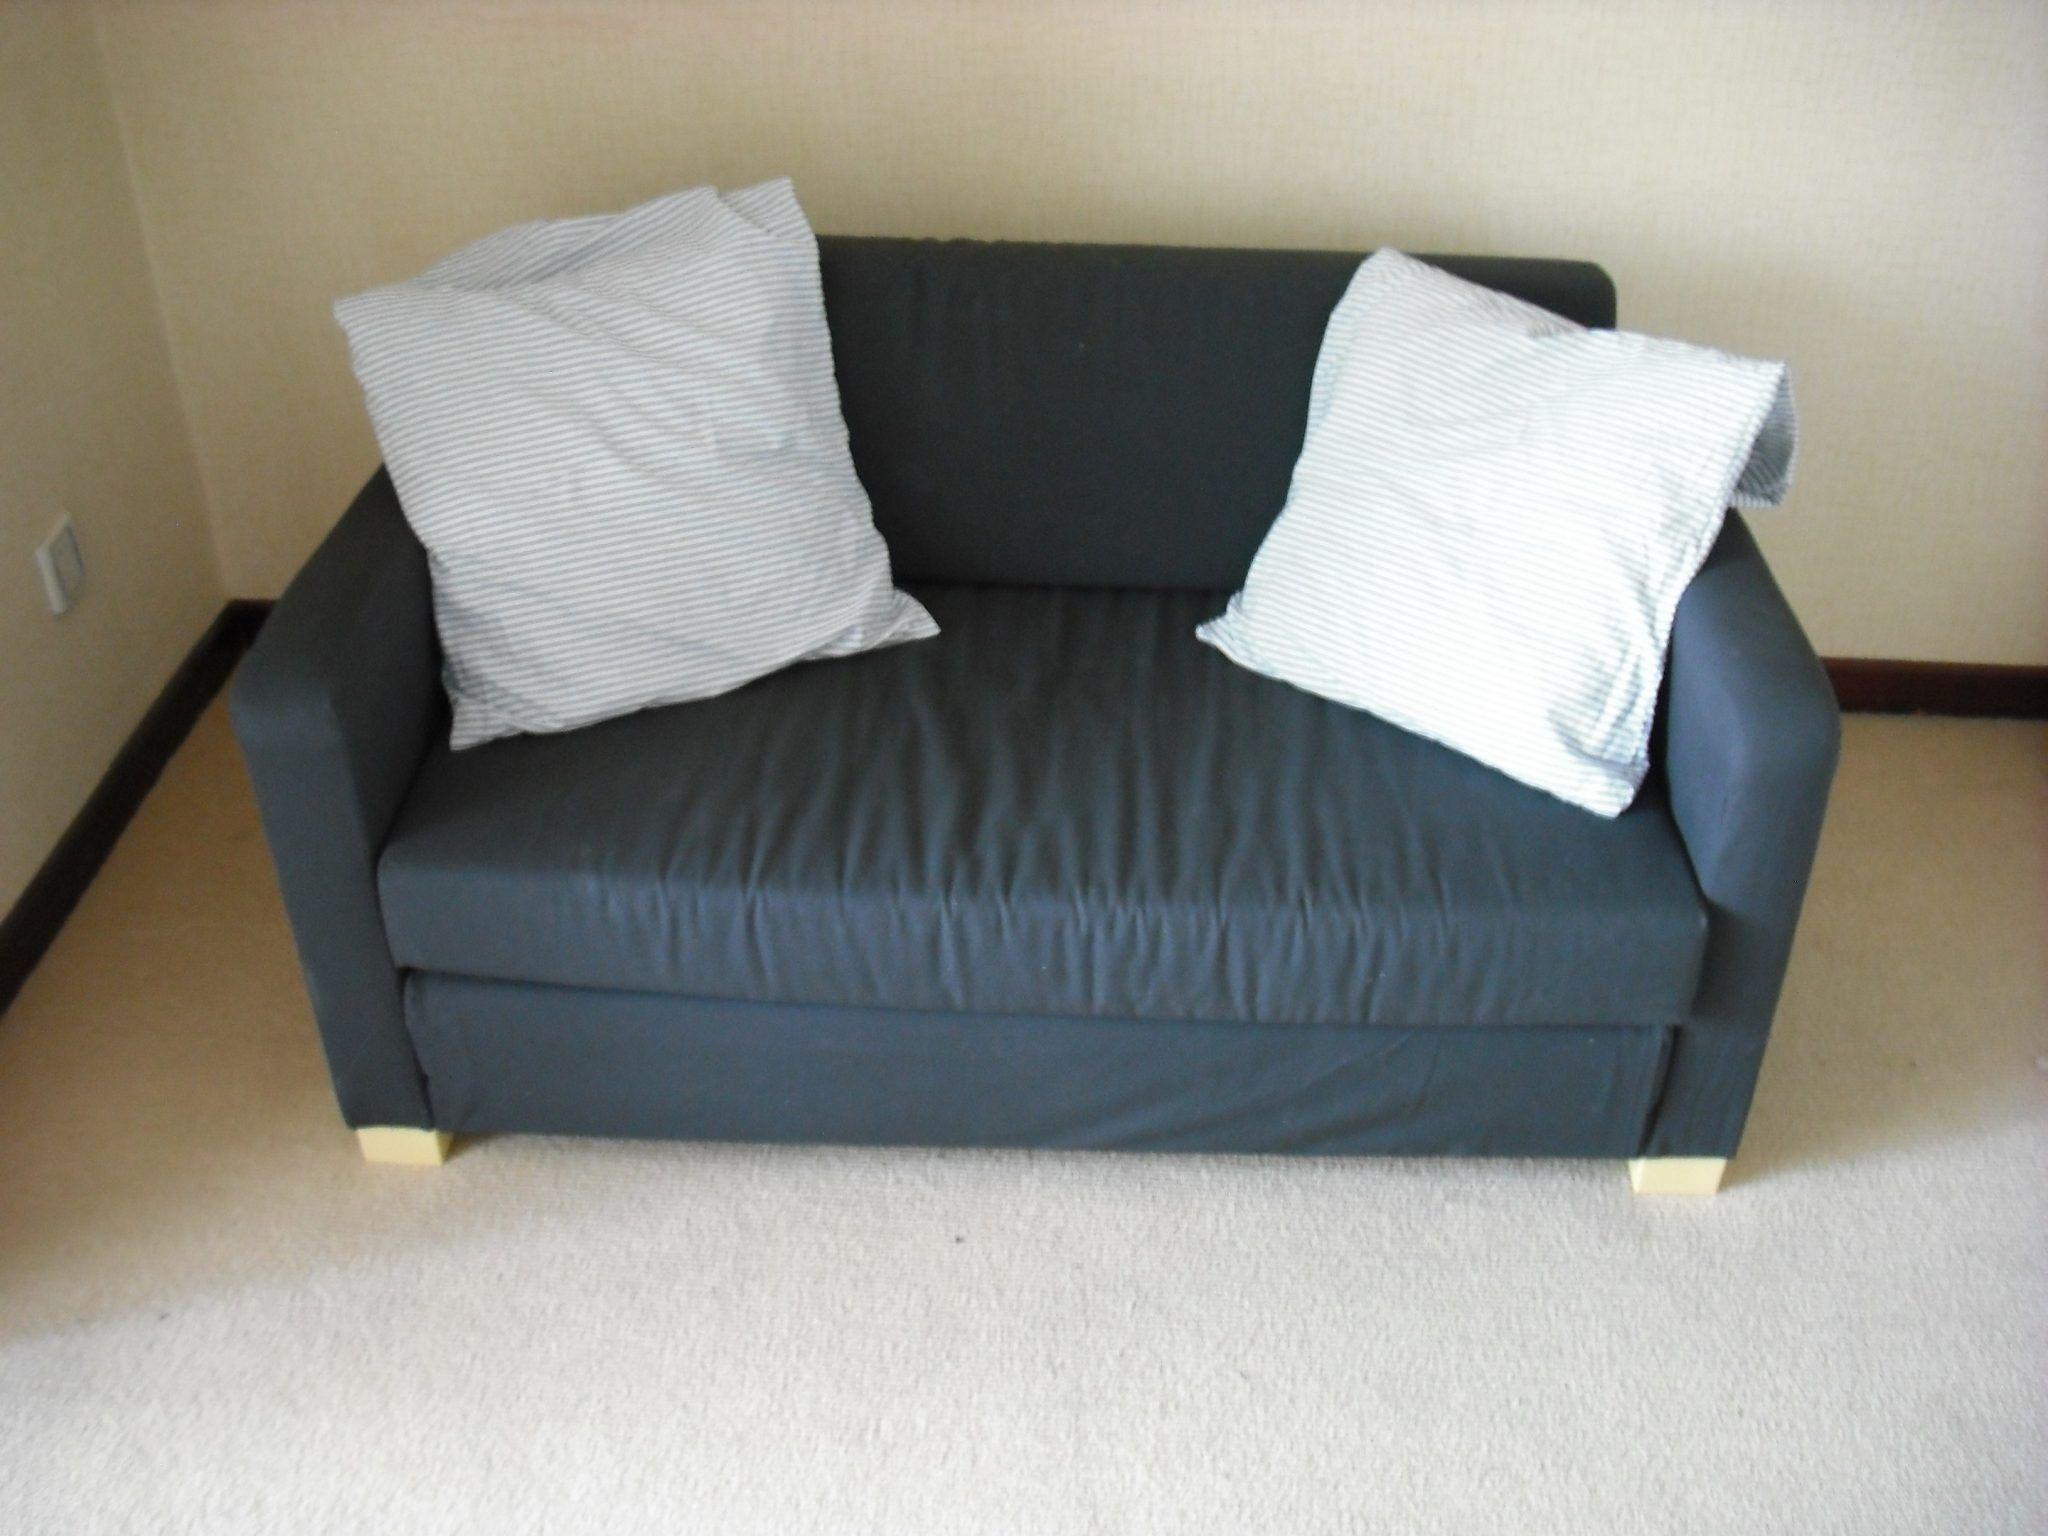 Ikea Solsta Sofa Bed Reviews